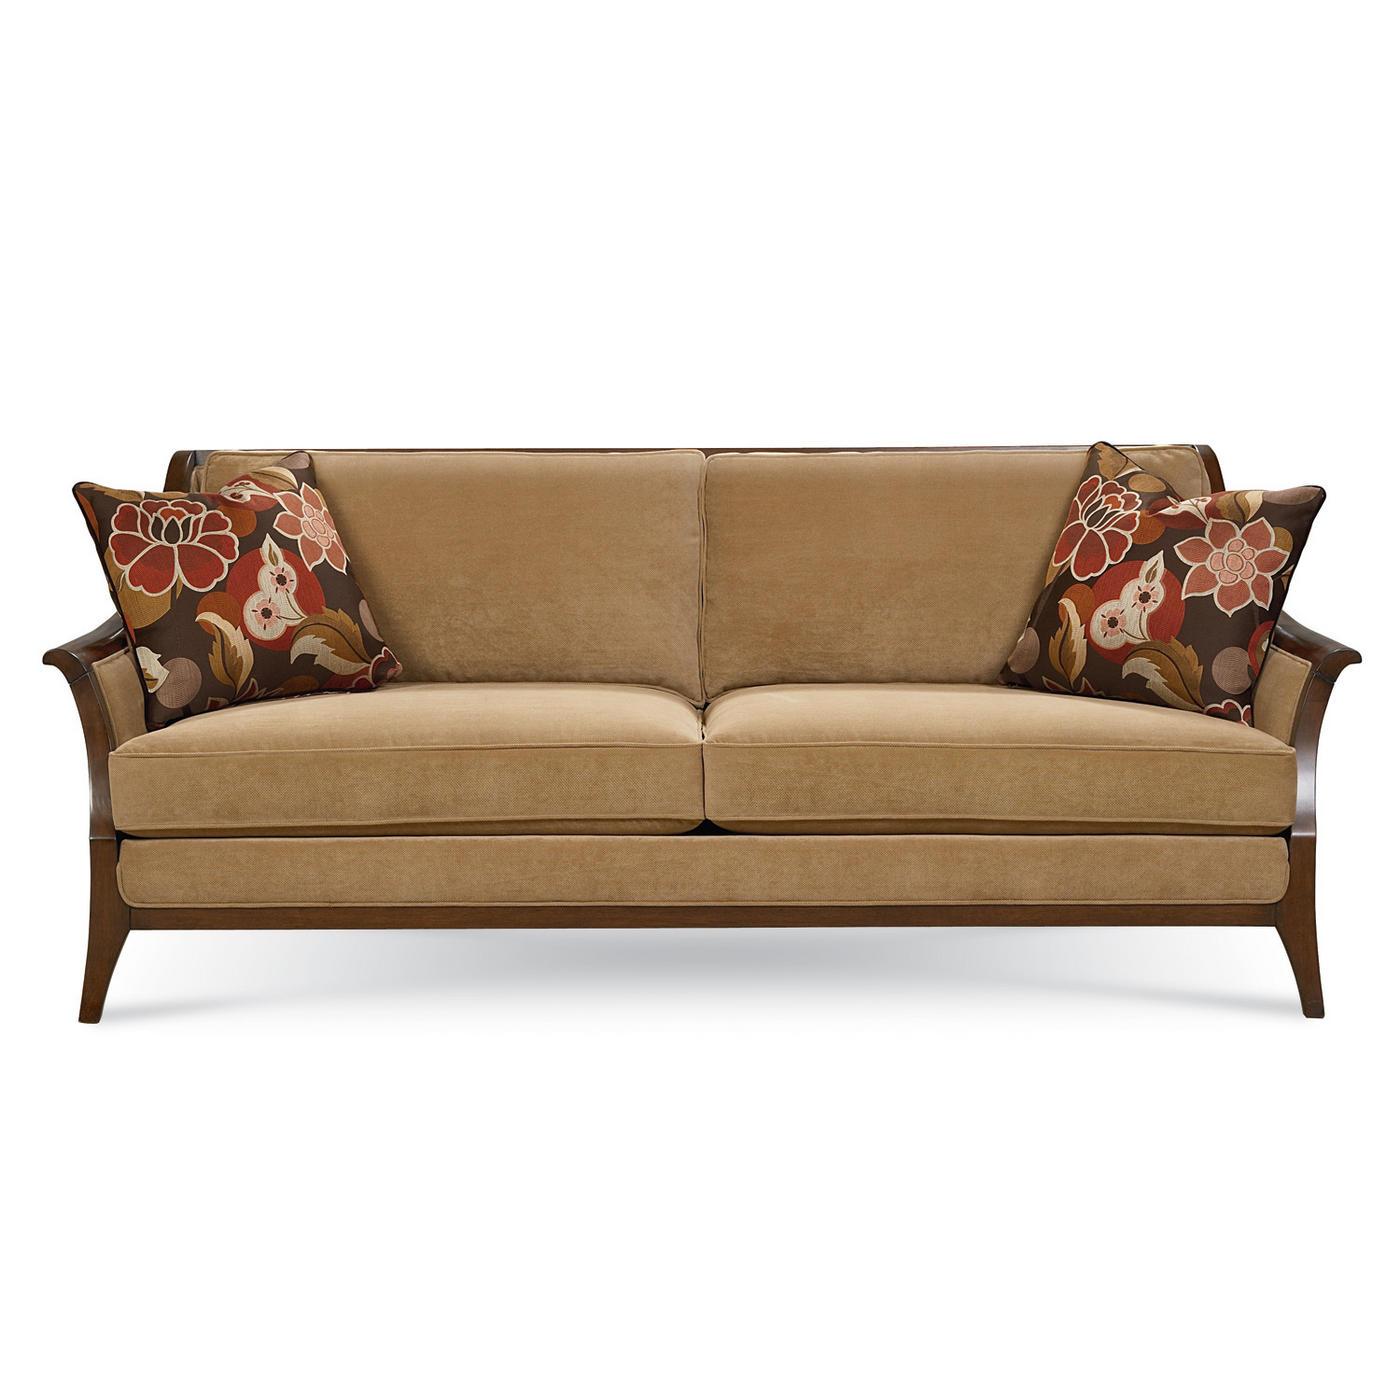 wooden sofa set photo gallery multiyork beds schnadig international upholstery ella wood by